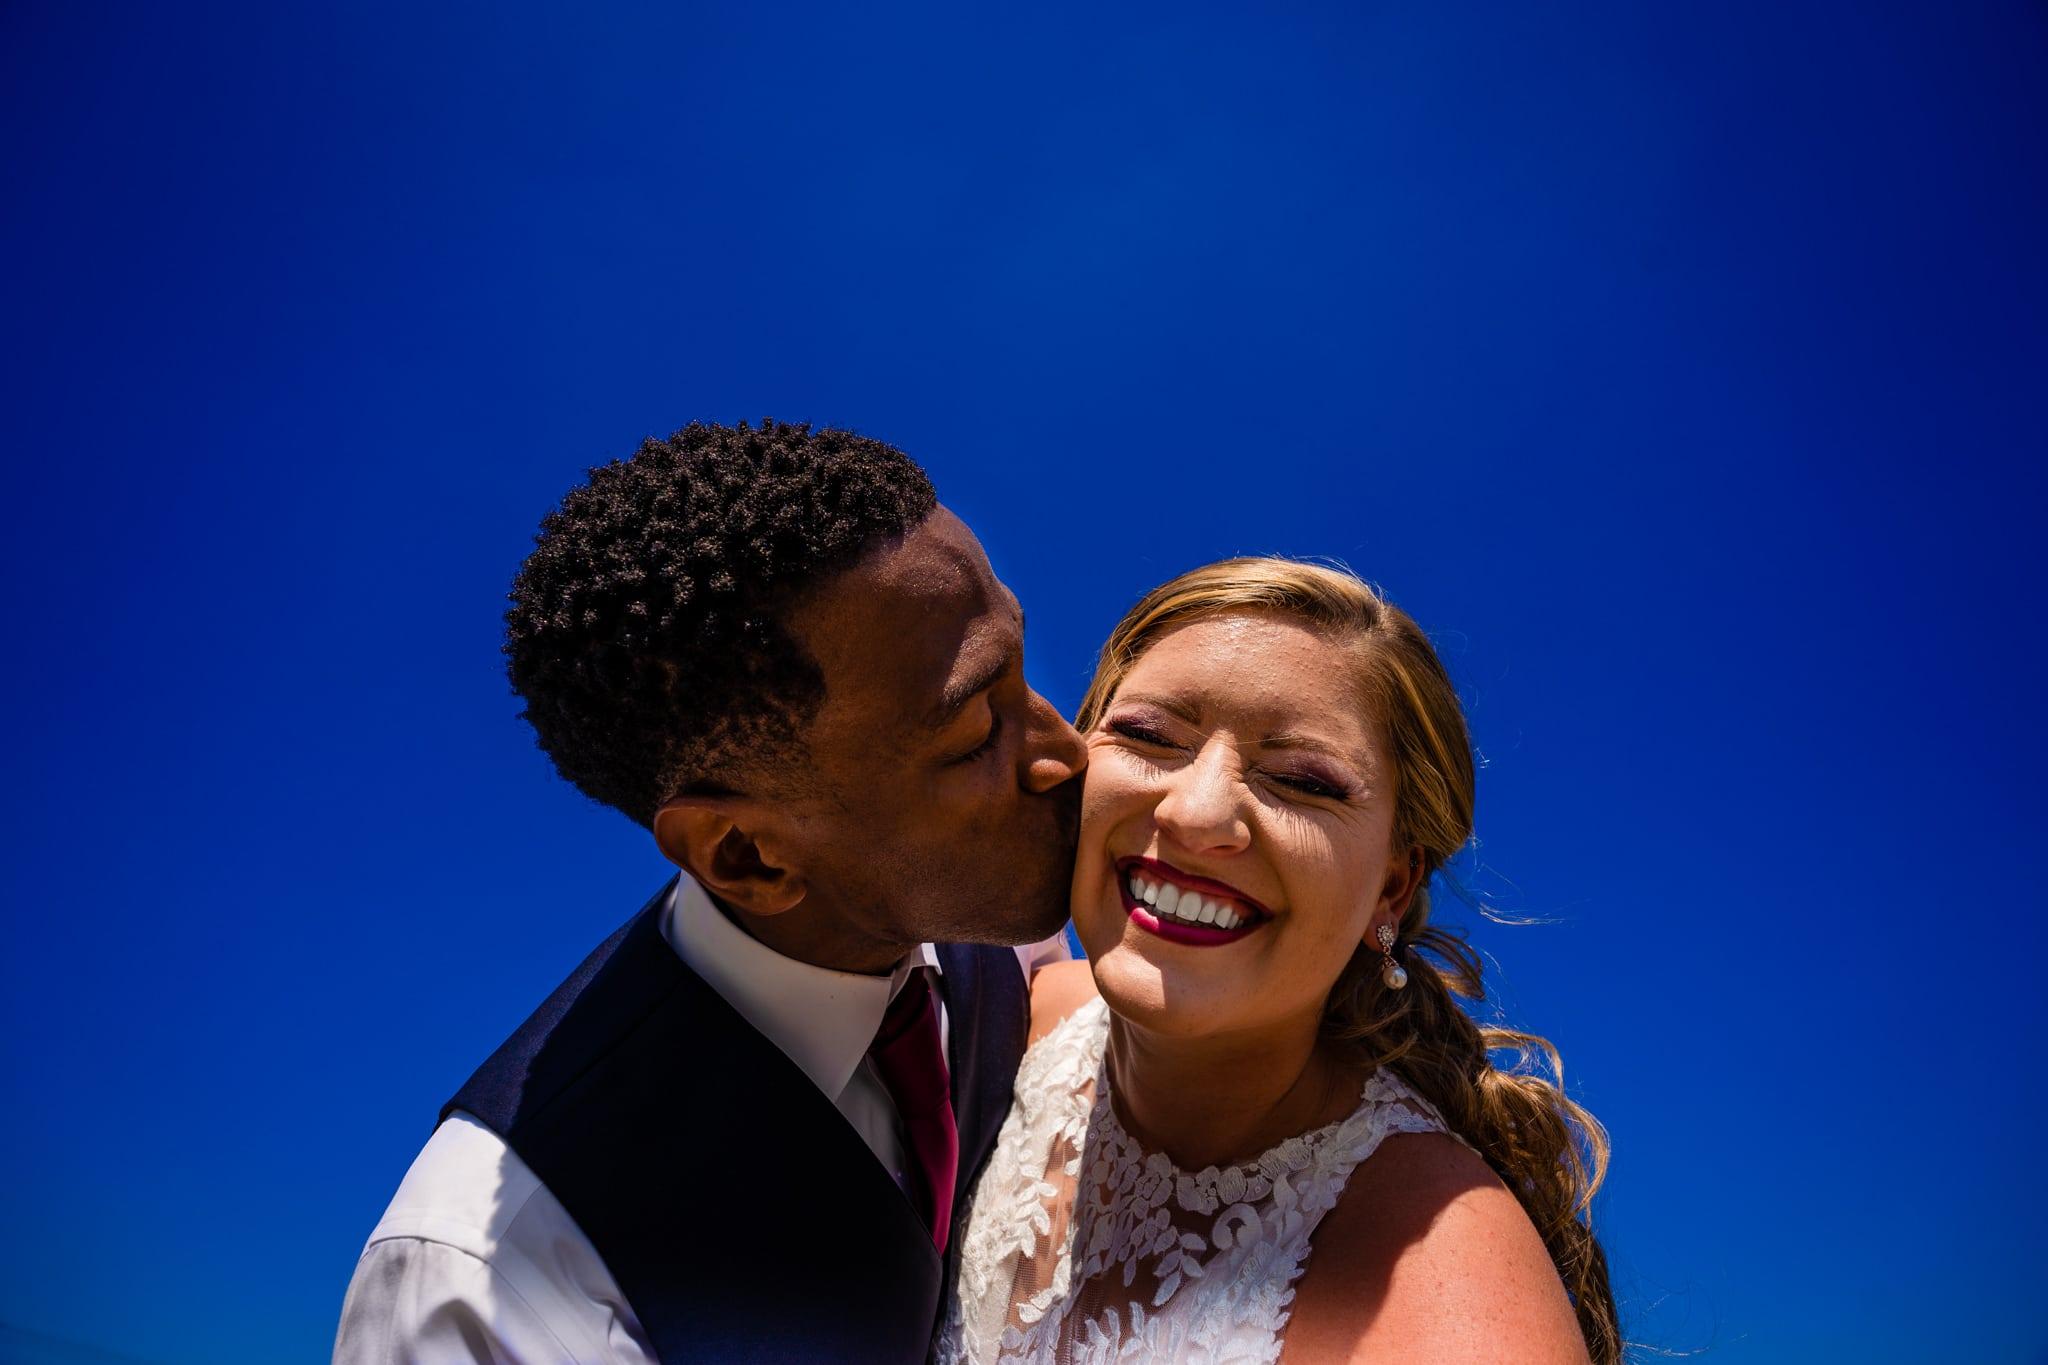 Studio 22 Photography - Dayton & Cincinnati Wedding Photographers